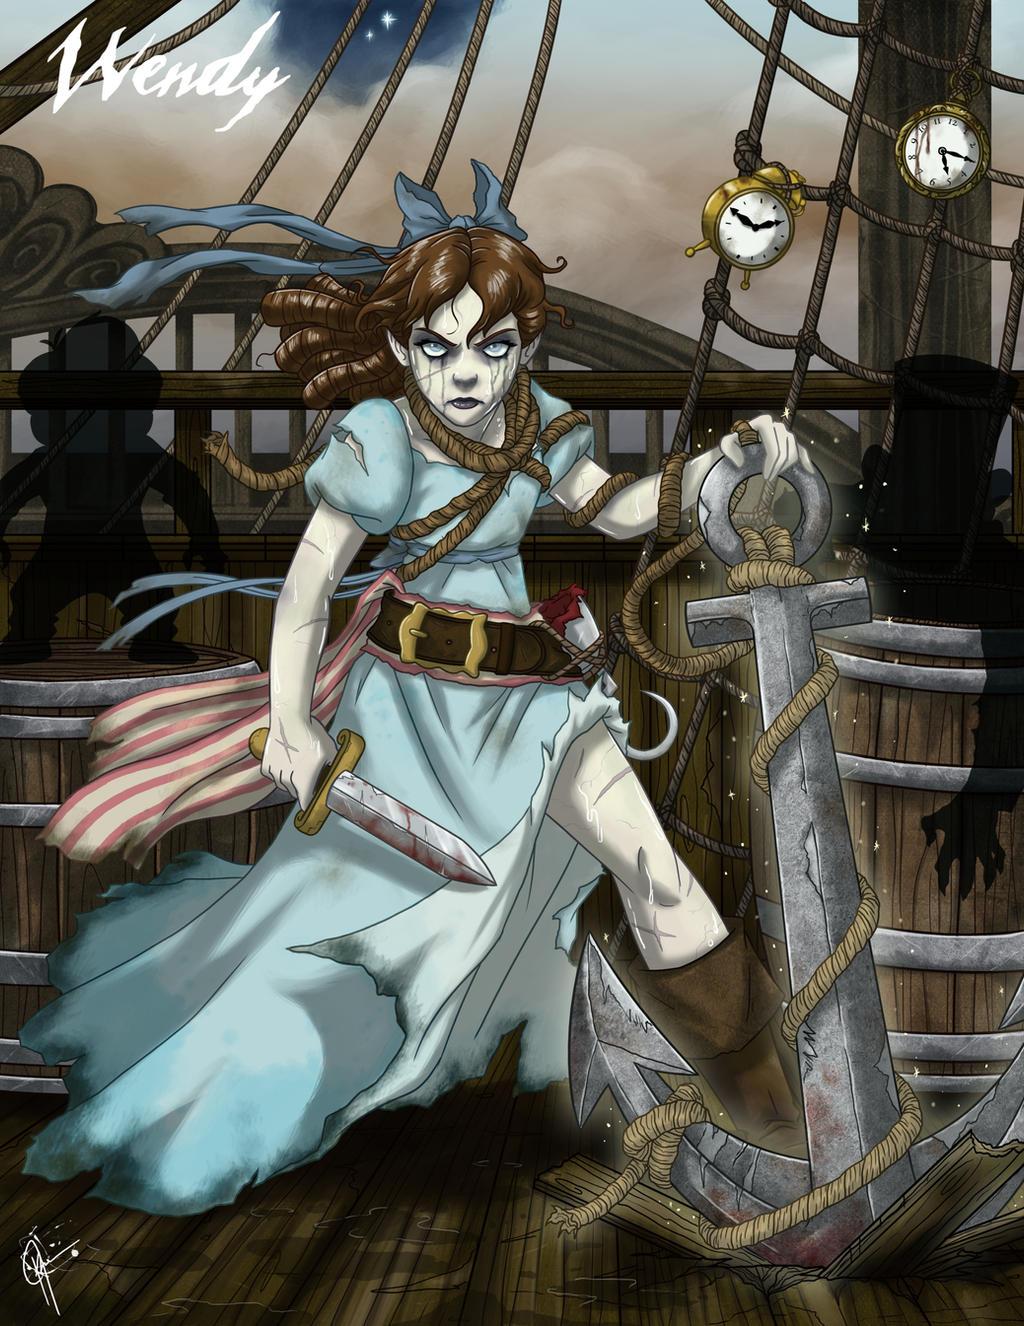 Twisted Princess: Wendy